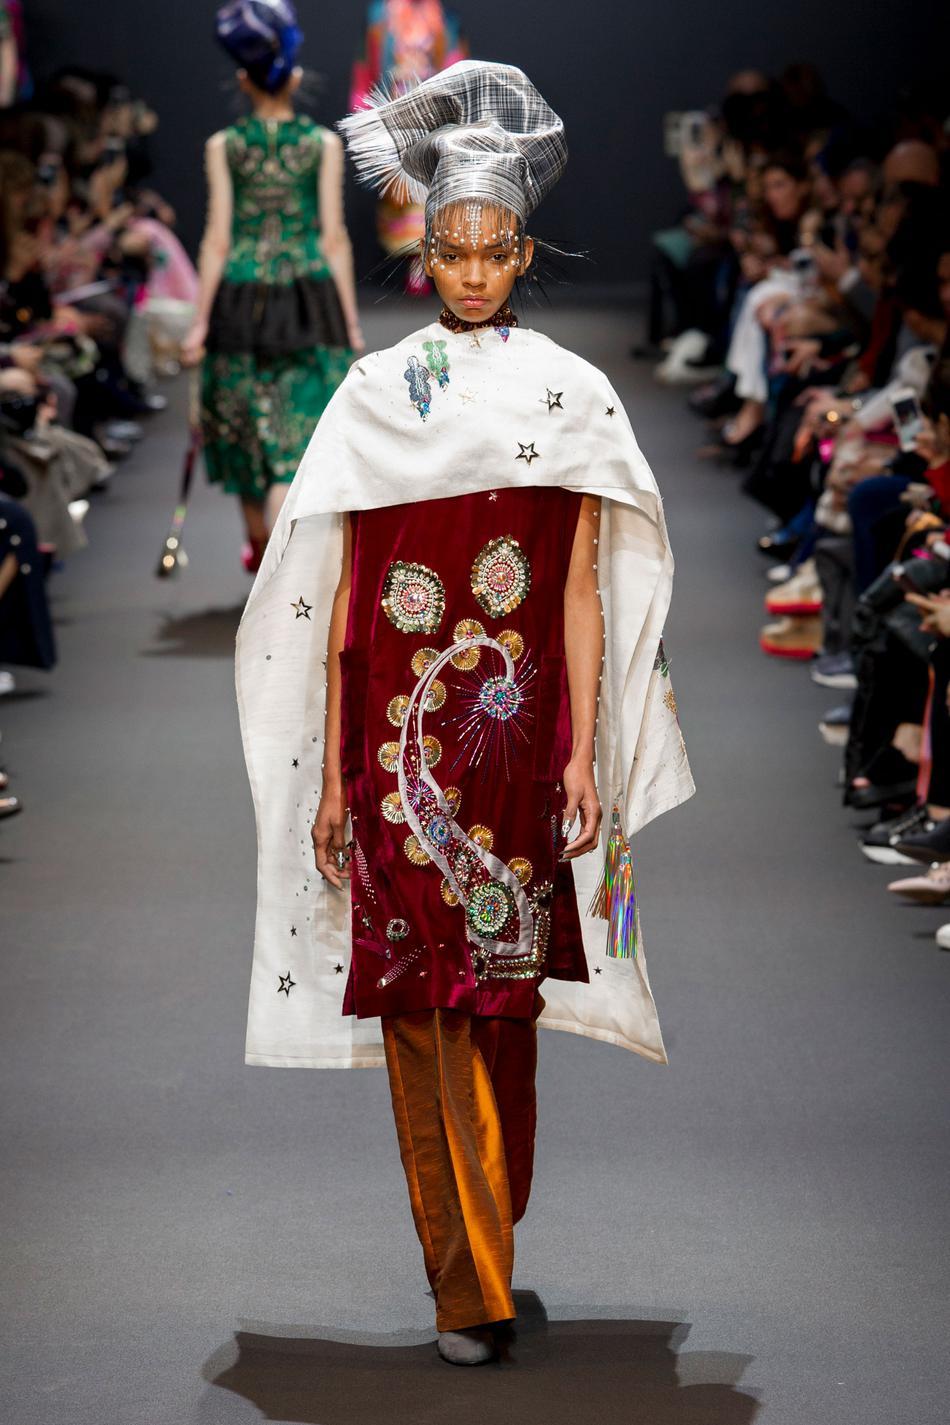 Défilé Manish Arora Fashion Week 2017 - Look 12